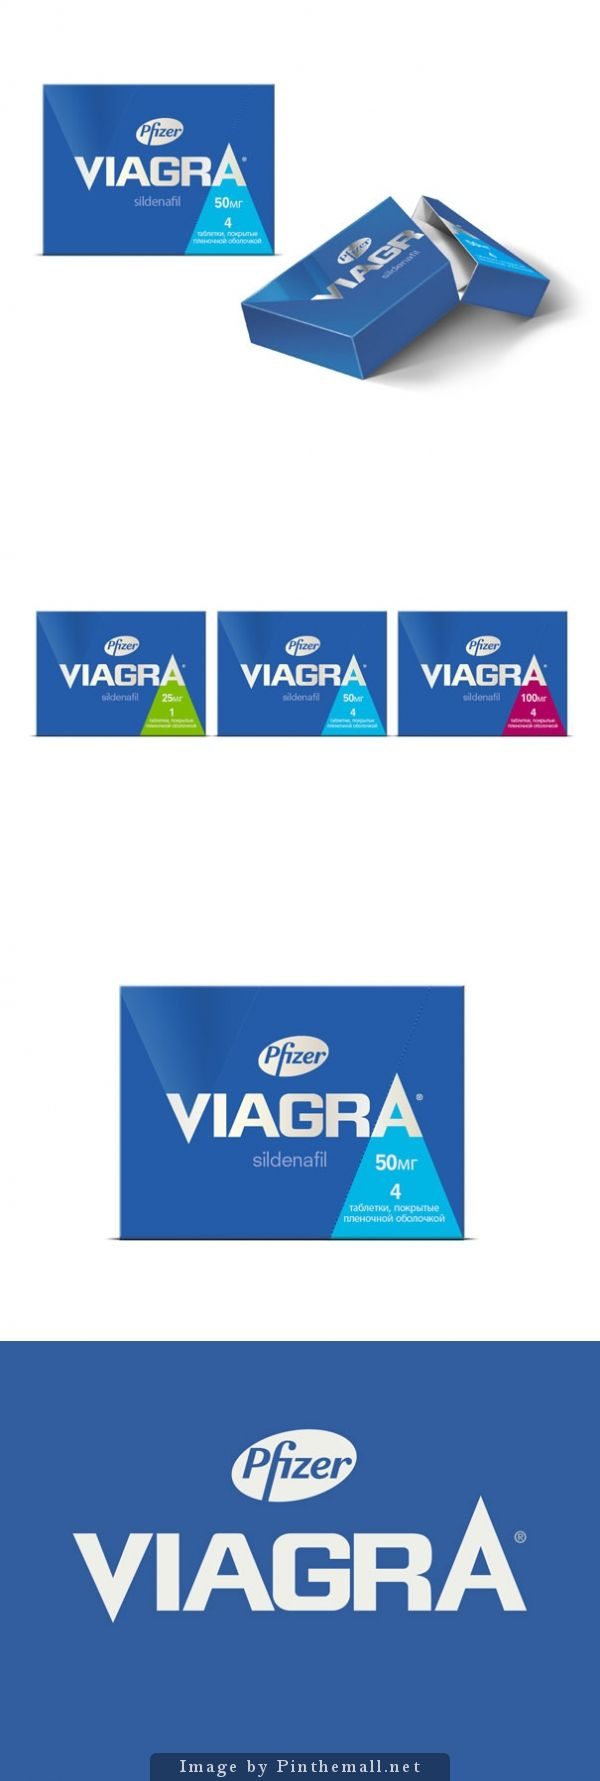 Pfizer #Viagra, Creative agency: Pearlfisher - http://www.packagingoftheworld.com/2014/10/pfizer-viagra.html